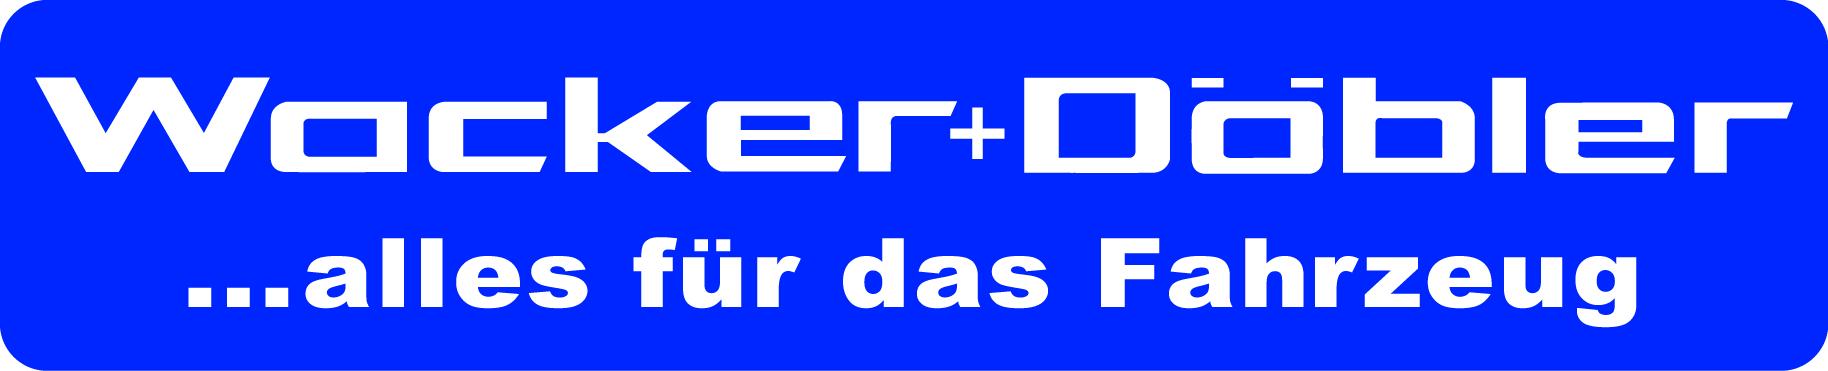 Sherpa Wacker und Döbler Logo